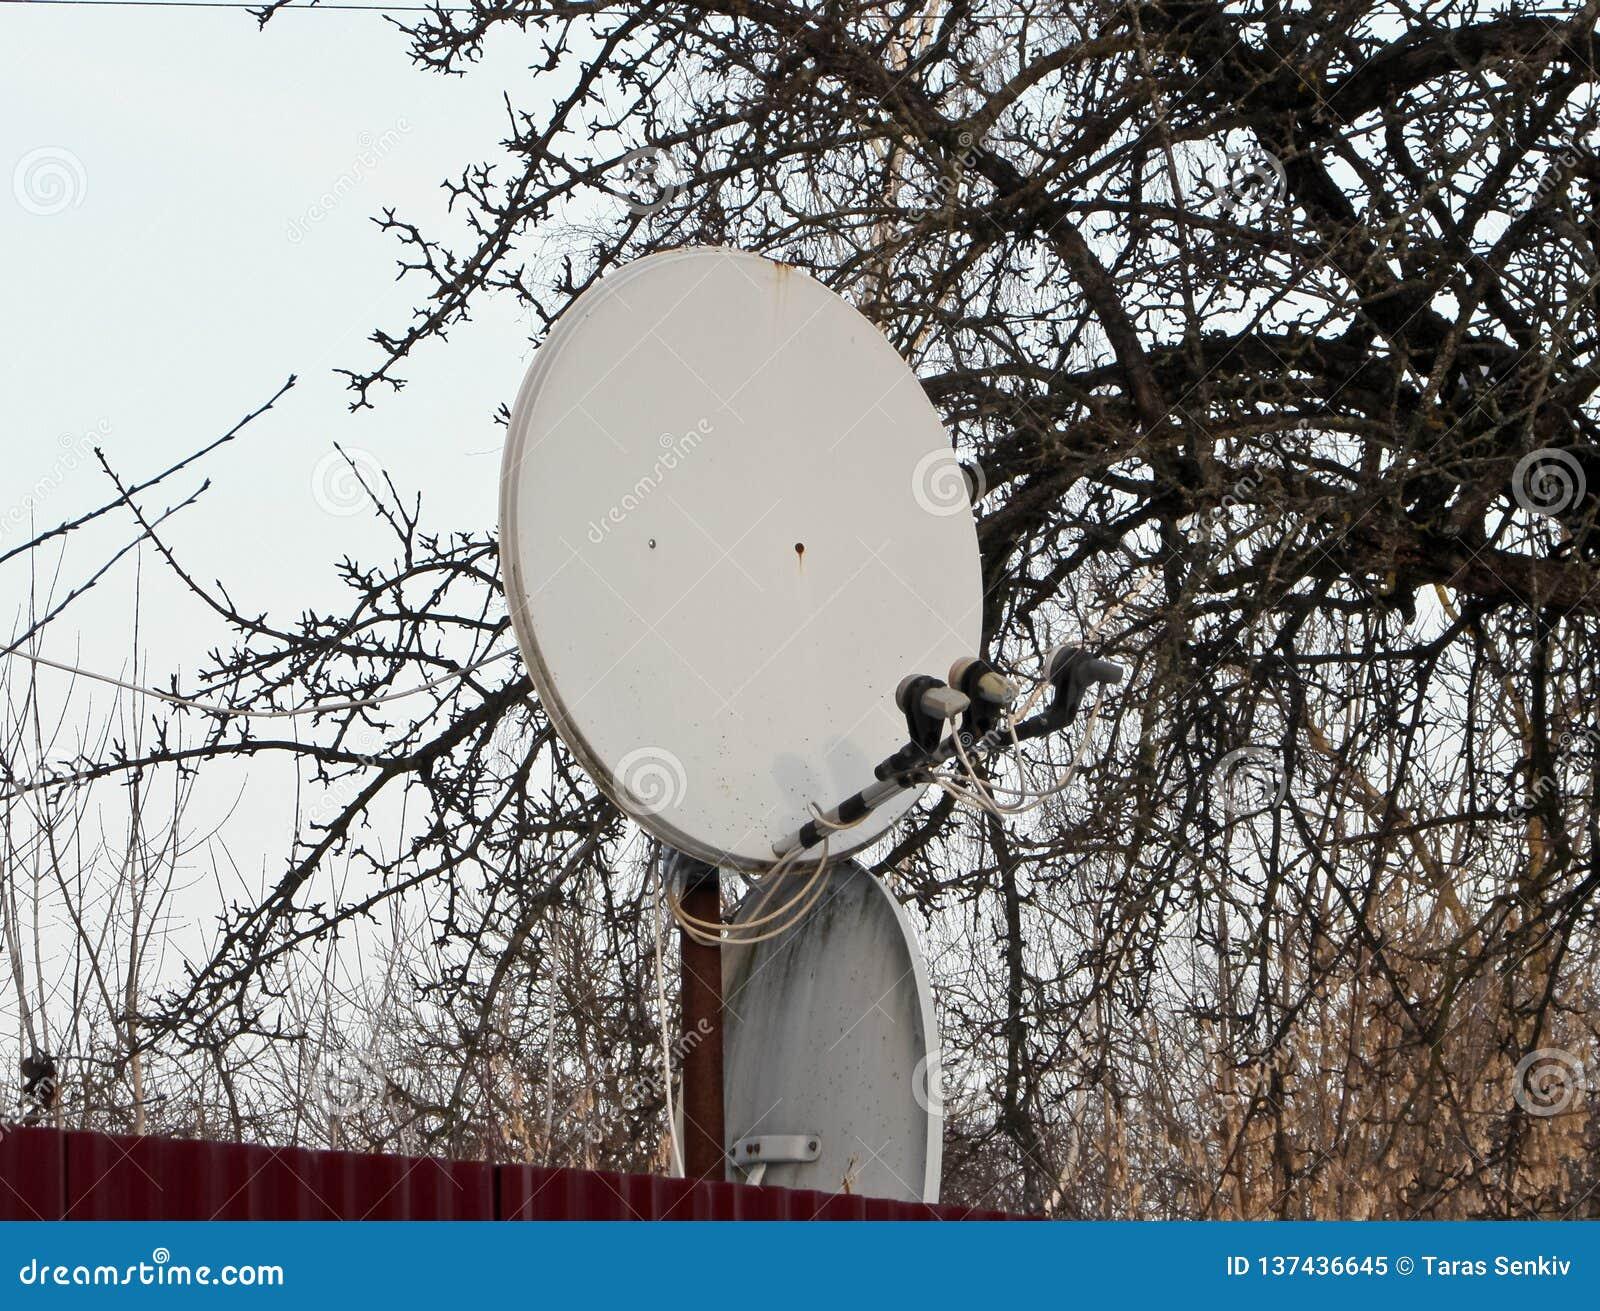 Satellite Tv And Internet >> Internet Communication And Tv Satellite Dish Installed On